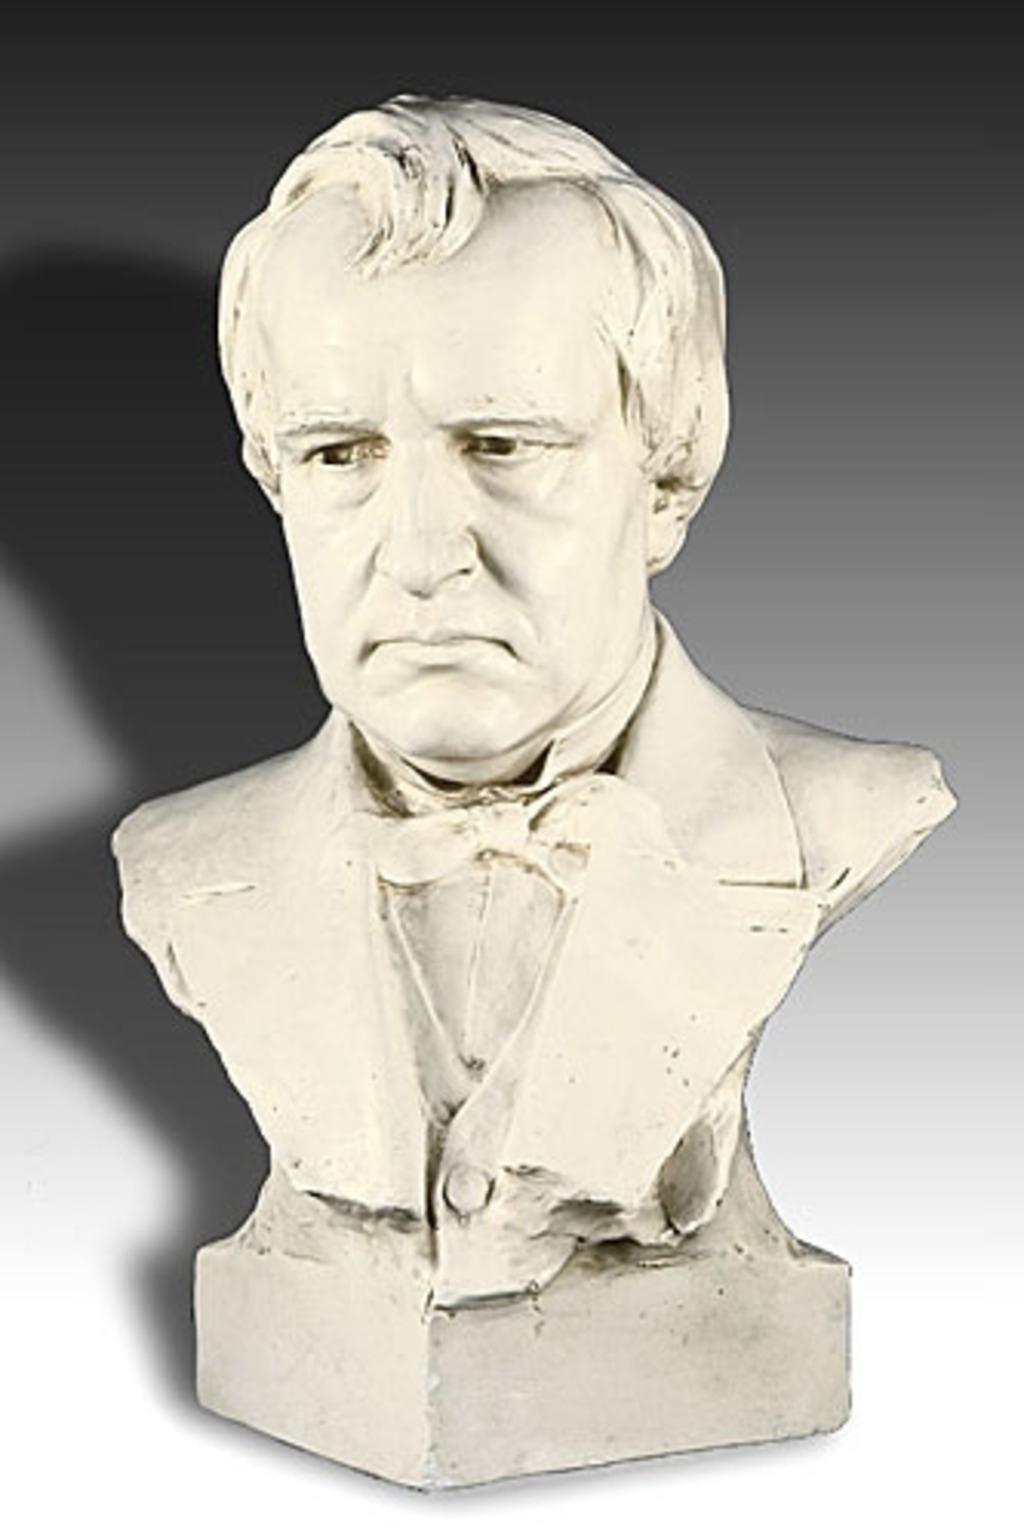 Sir Louis-Hippolyte La Fontaine